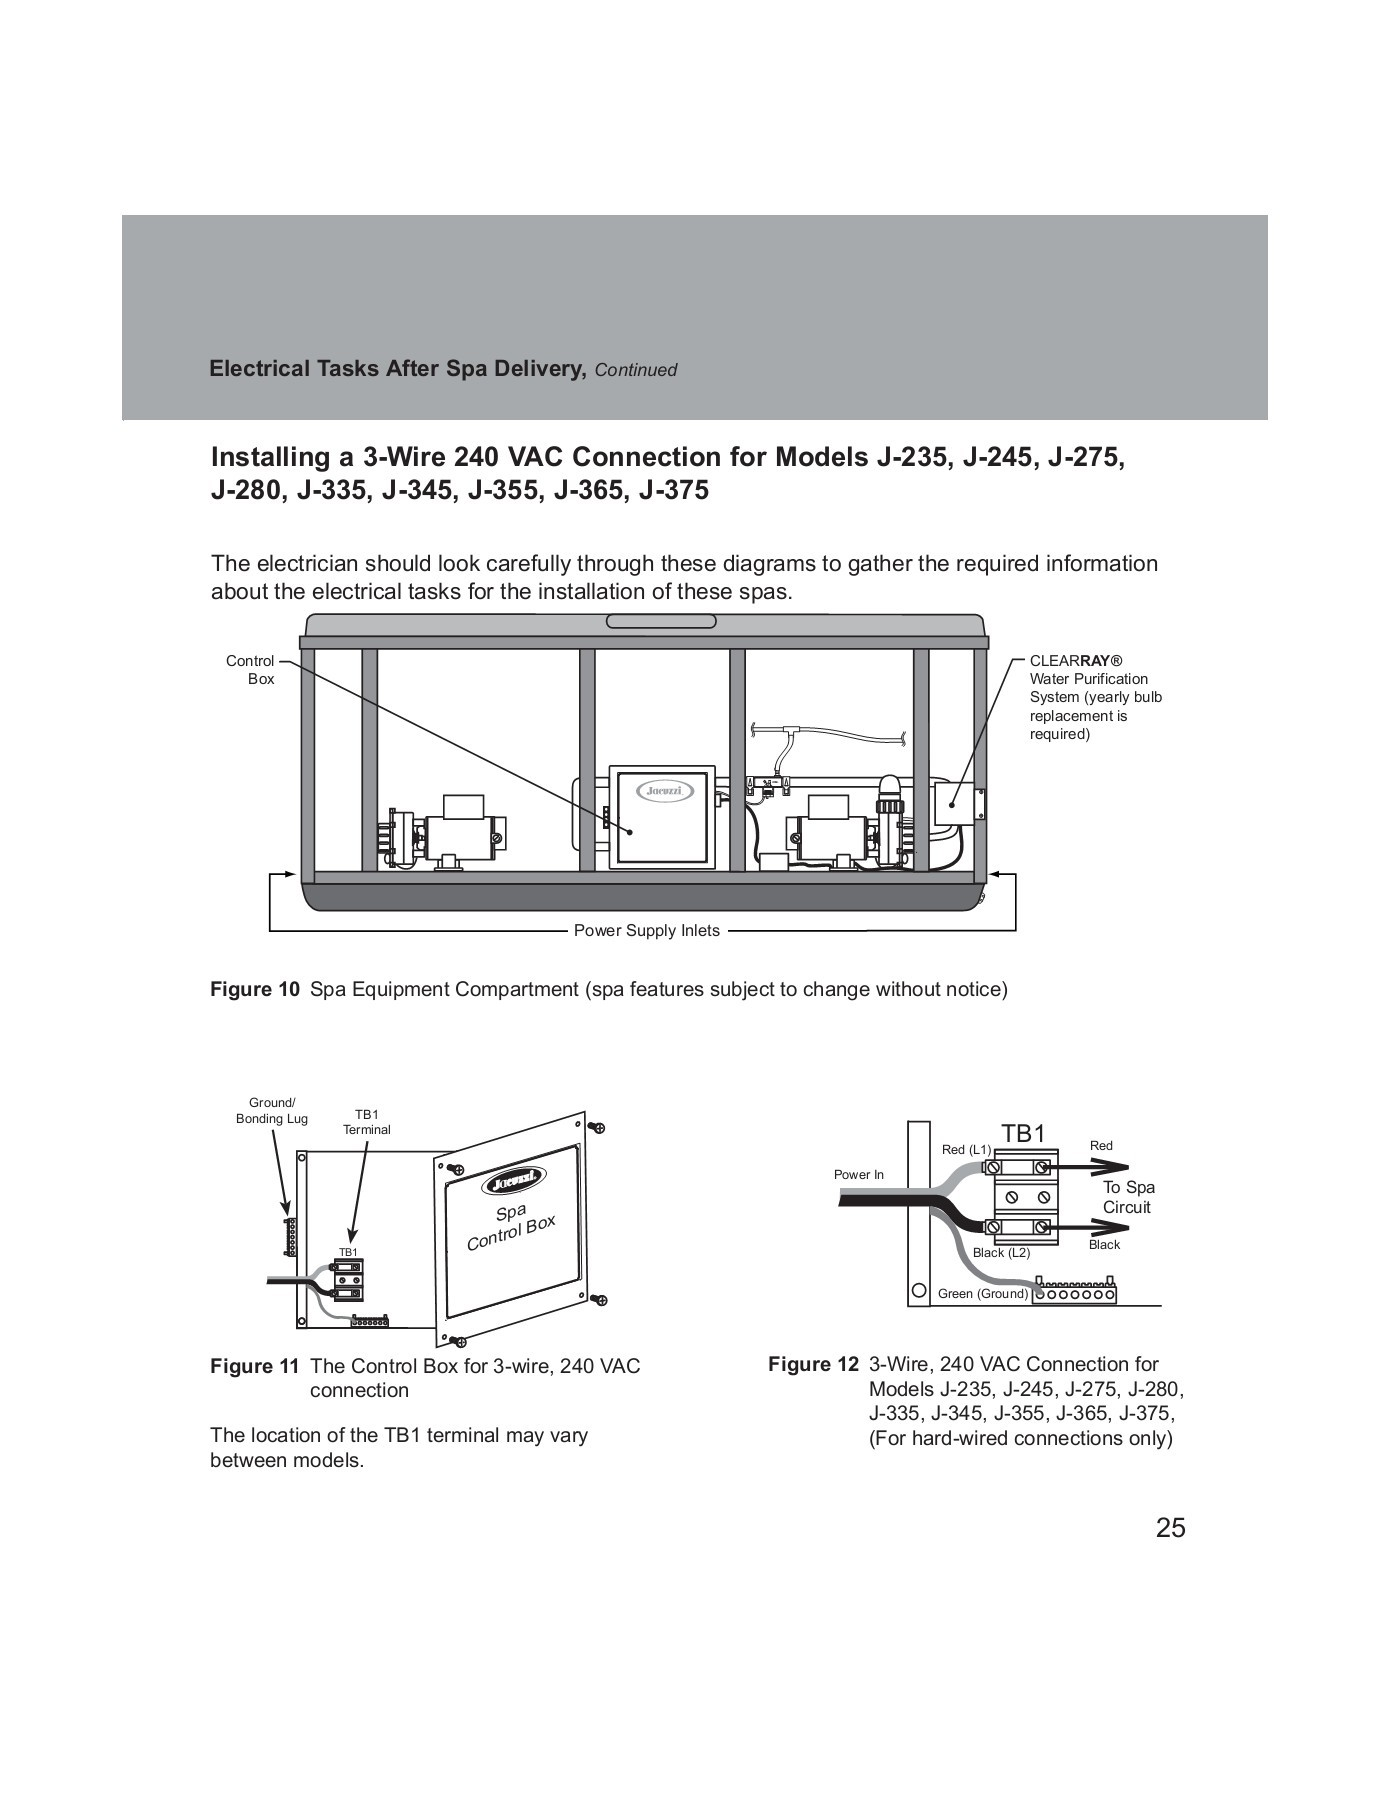 Electrical Guide J-335™, J-345™, J-355™, J-365™ & J-375™ on